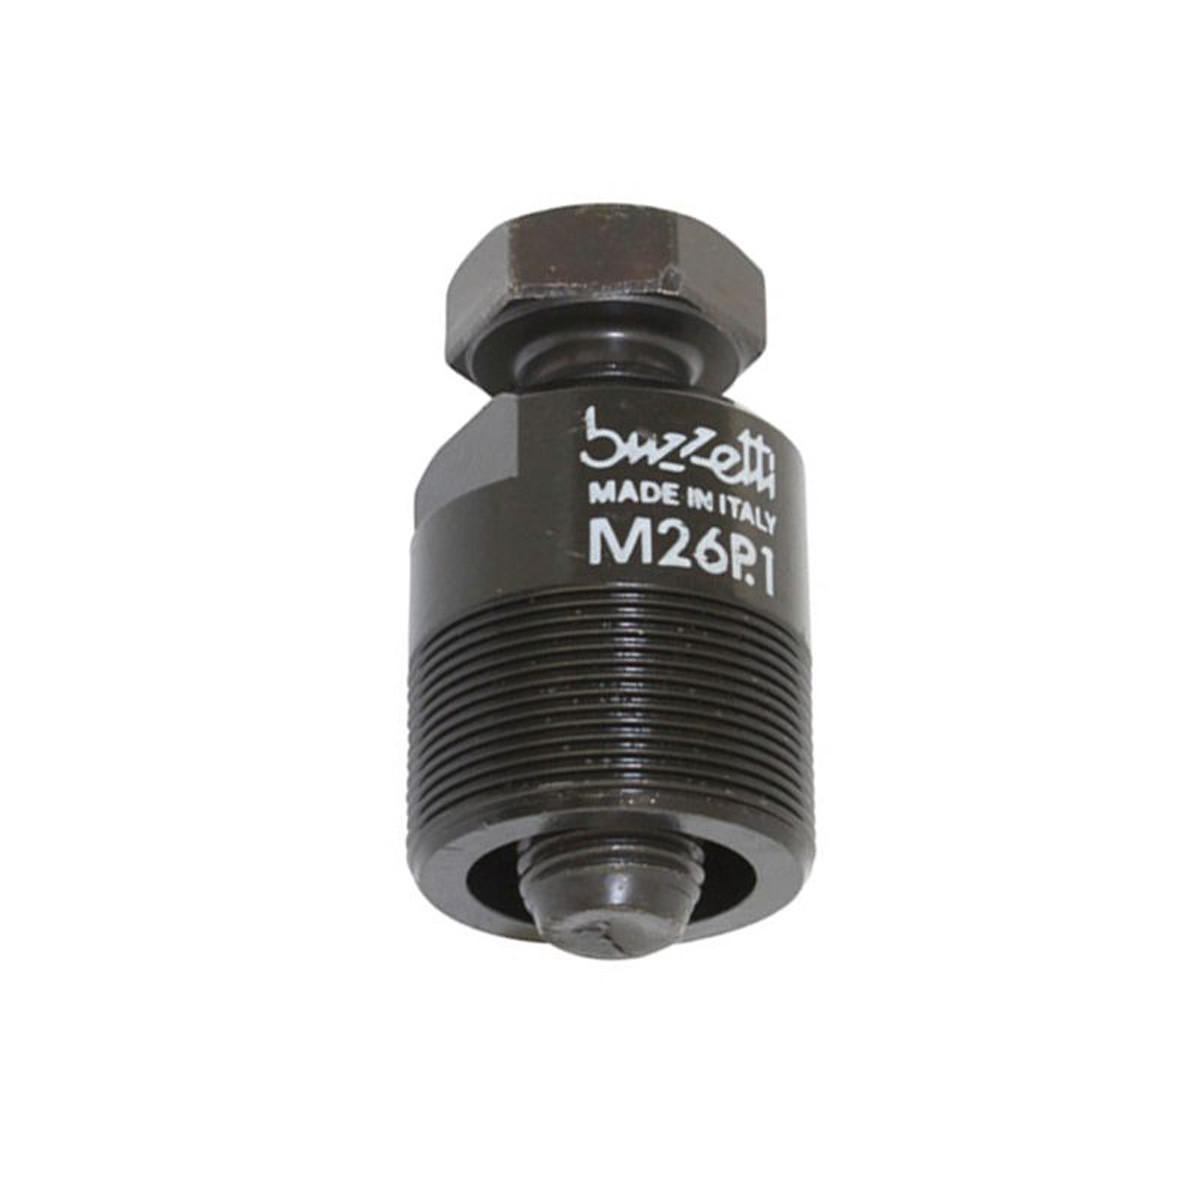 Arrache Volant 26x100 Adaptable Cyclos MBK, MOTOBECANE, MOTOCONFORT à Allumage à Rupteur